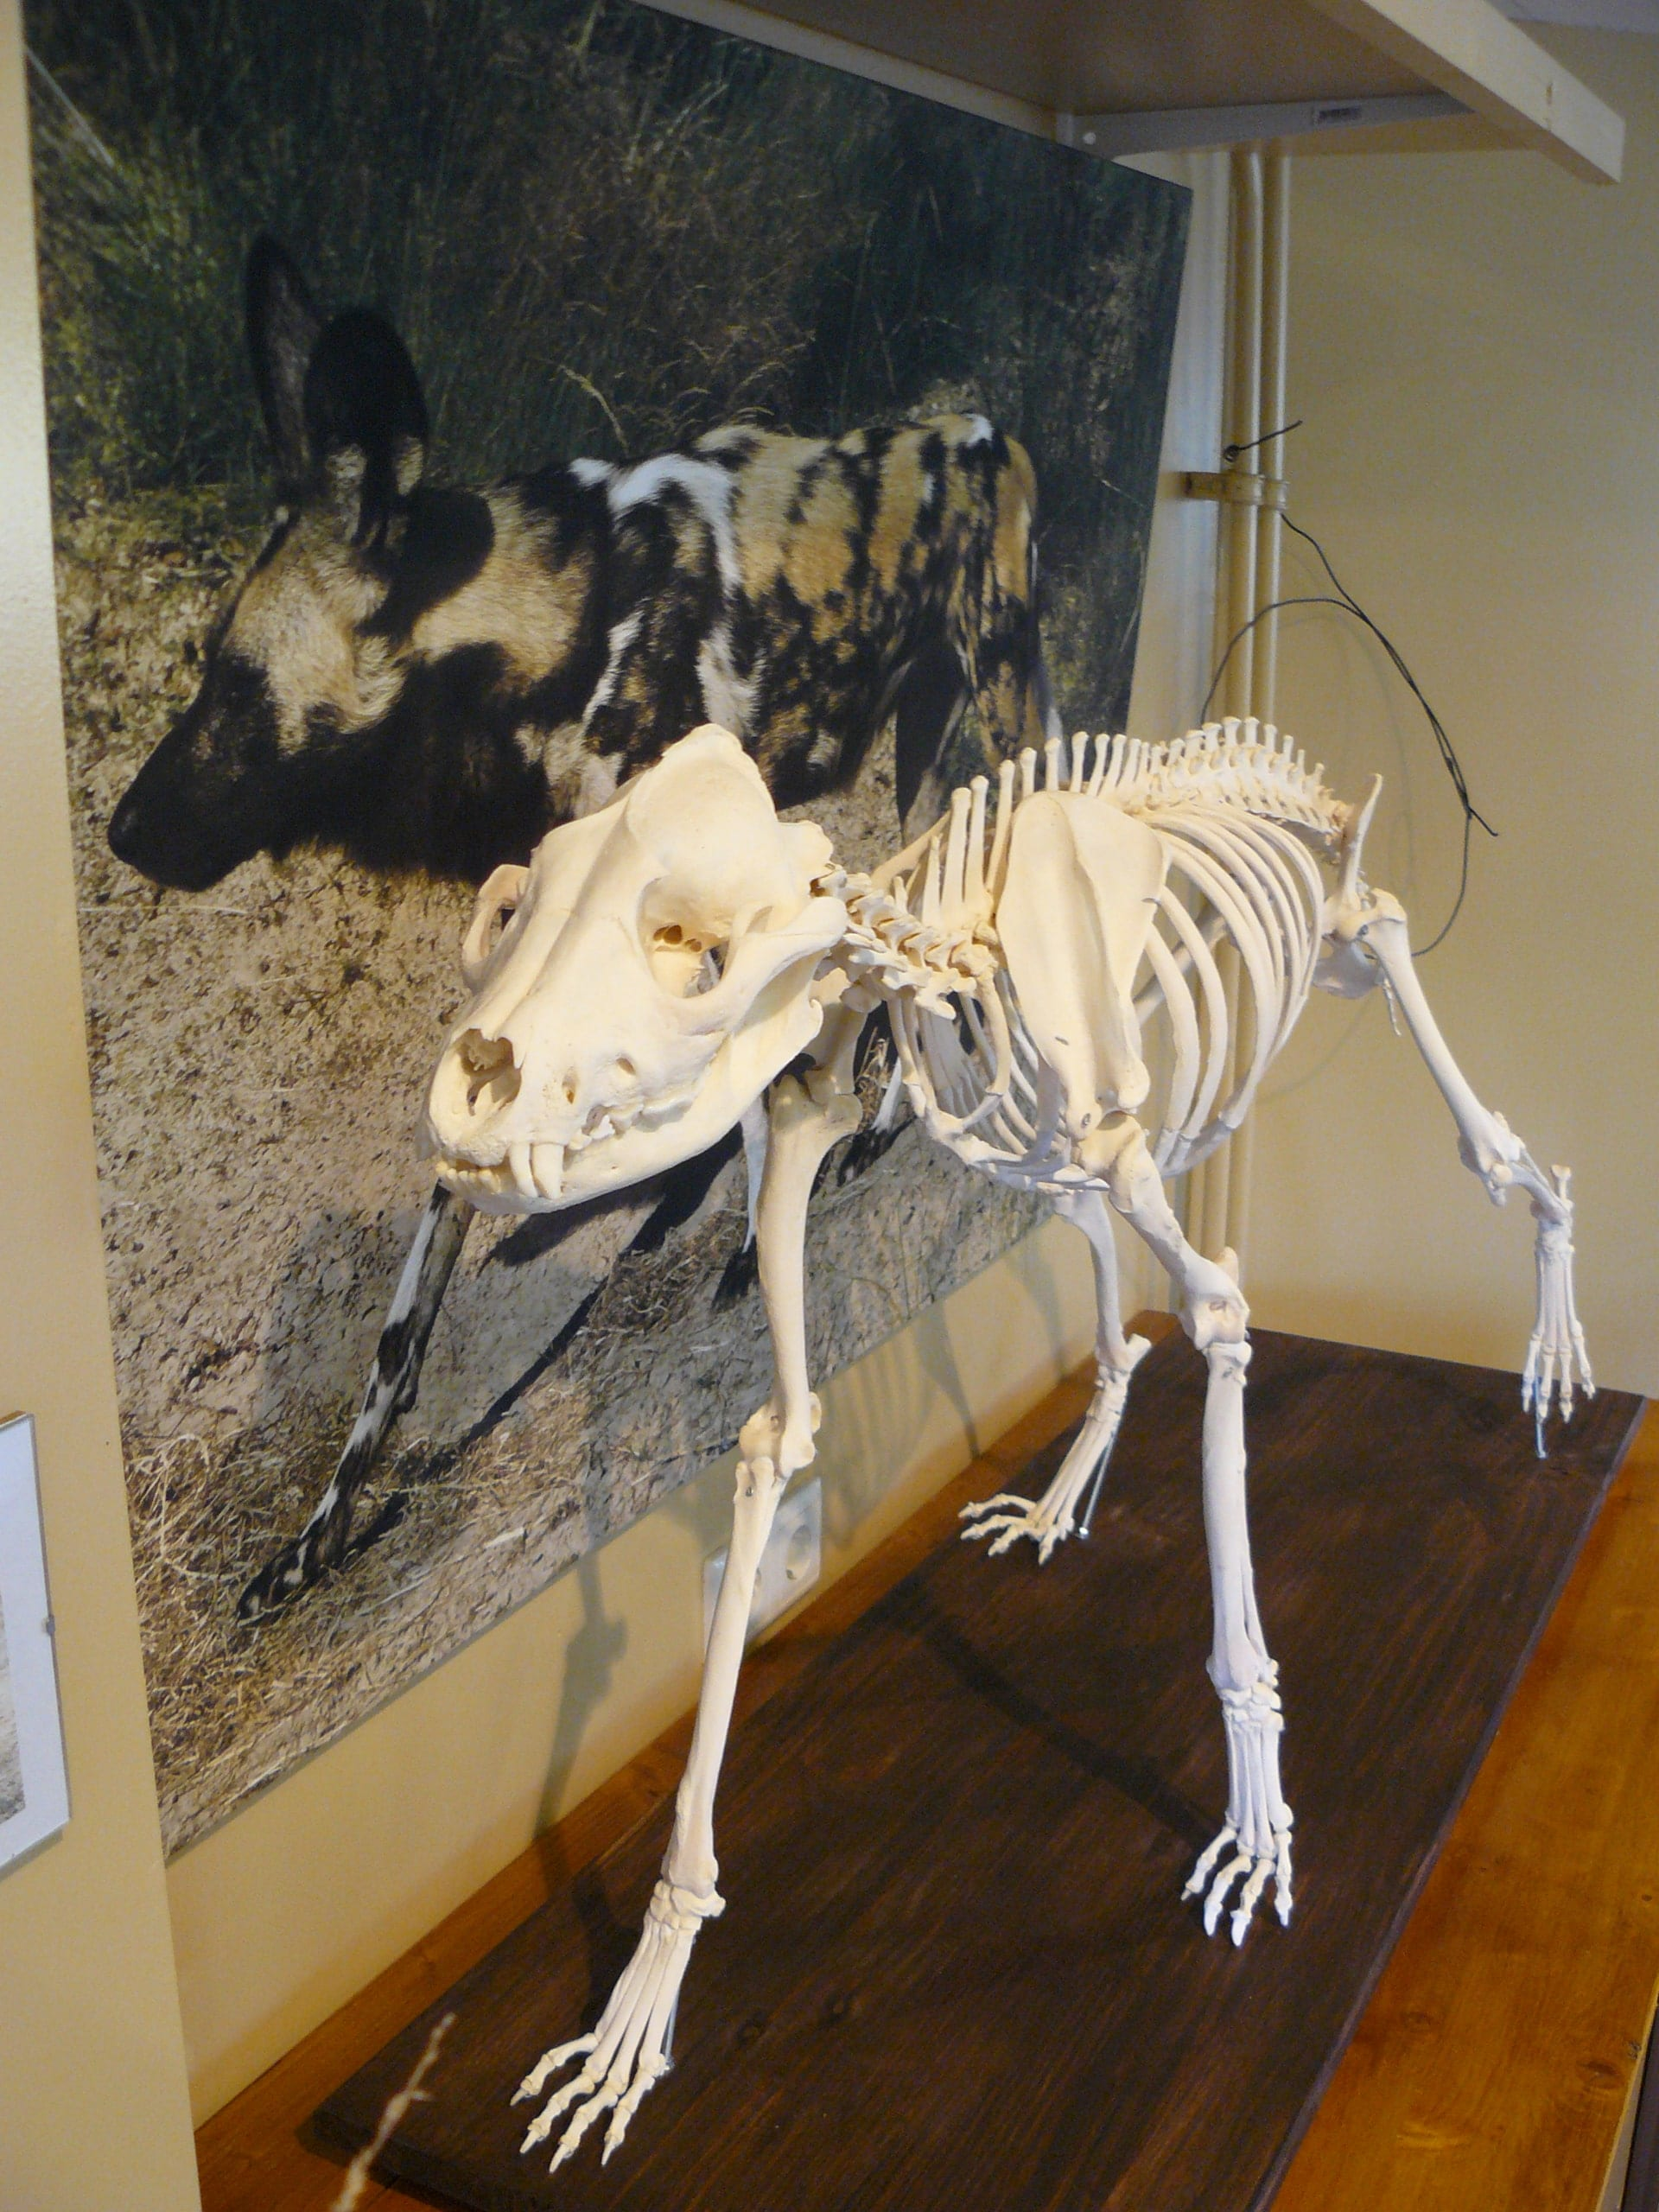 Skelette | Afrikanischer wilder Hund | Safaripark Beekse Bergen